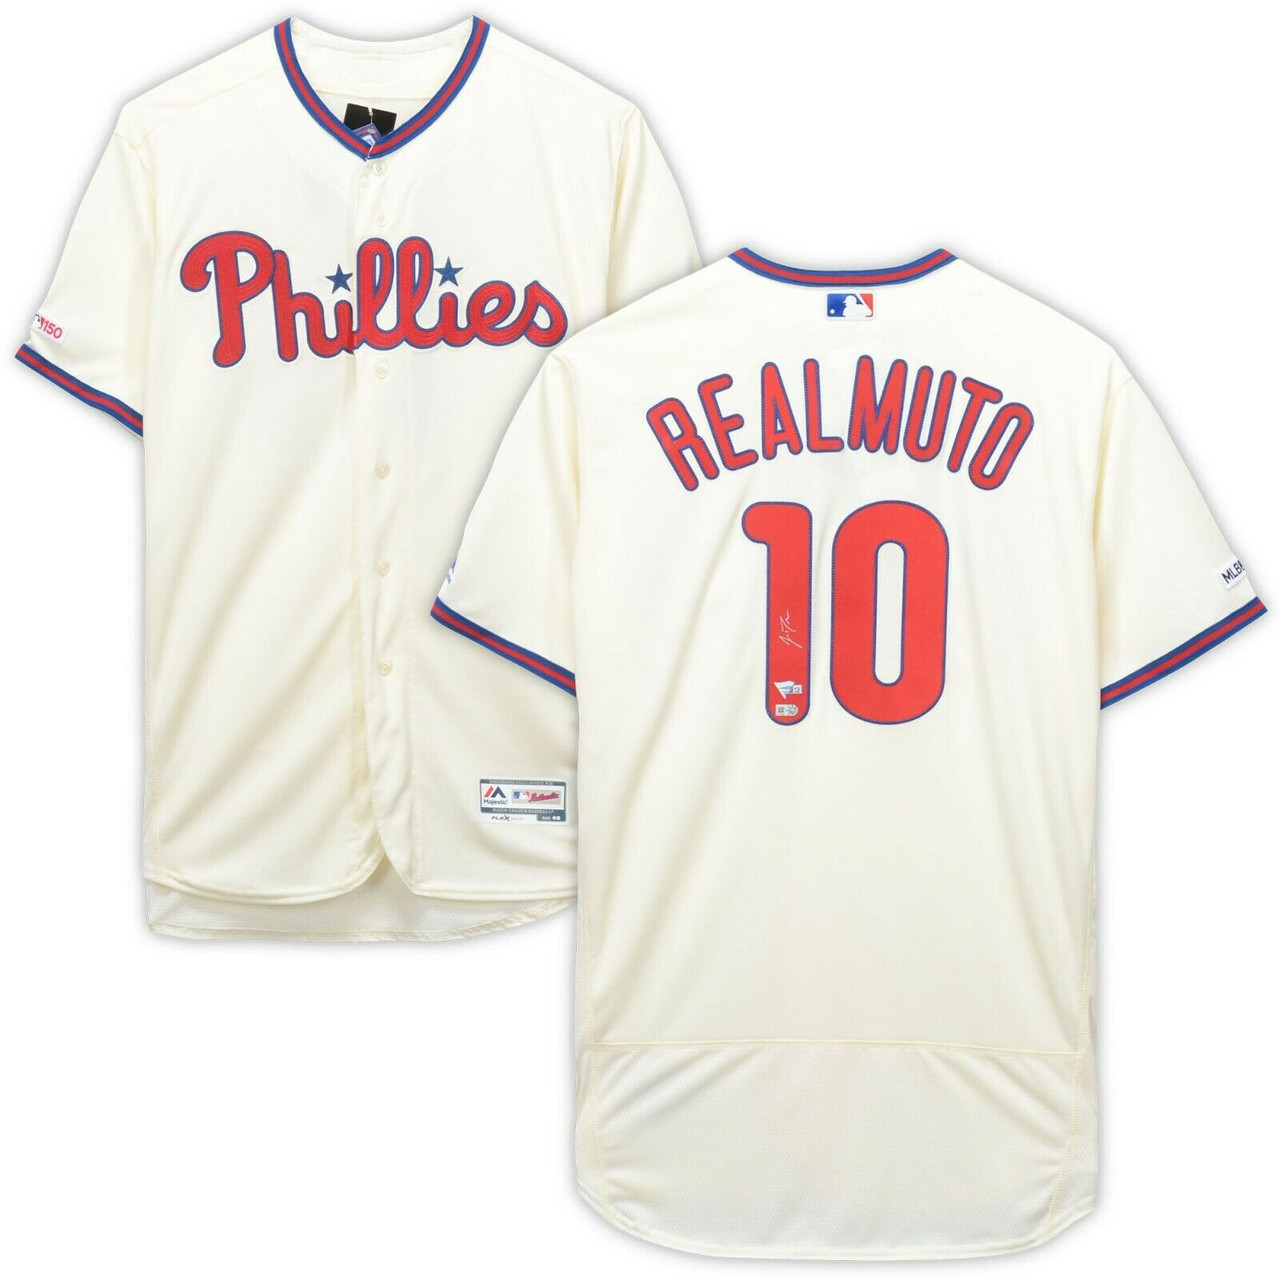 phillies cream jersey